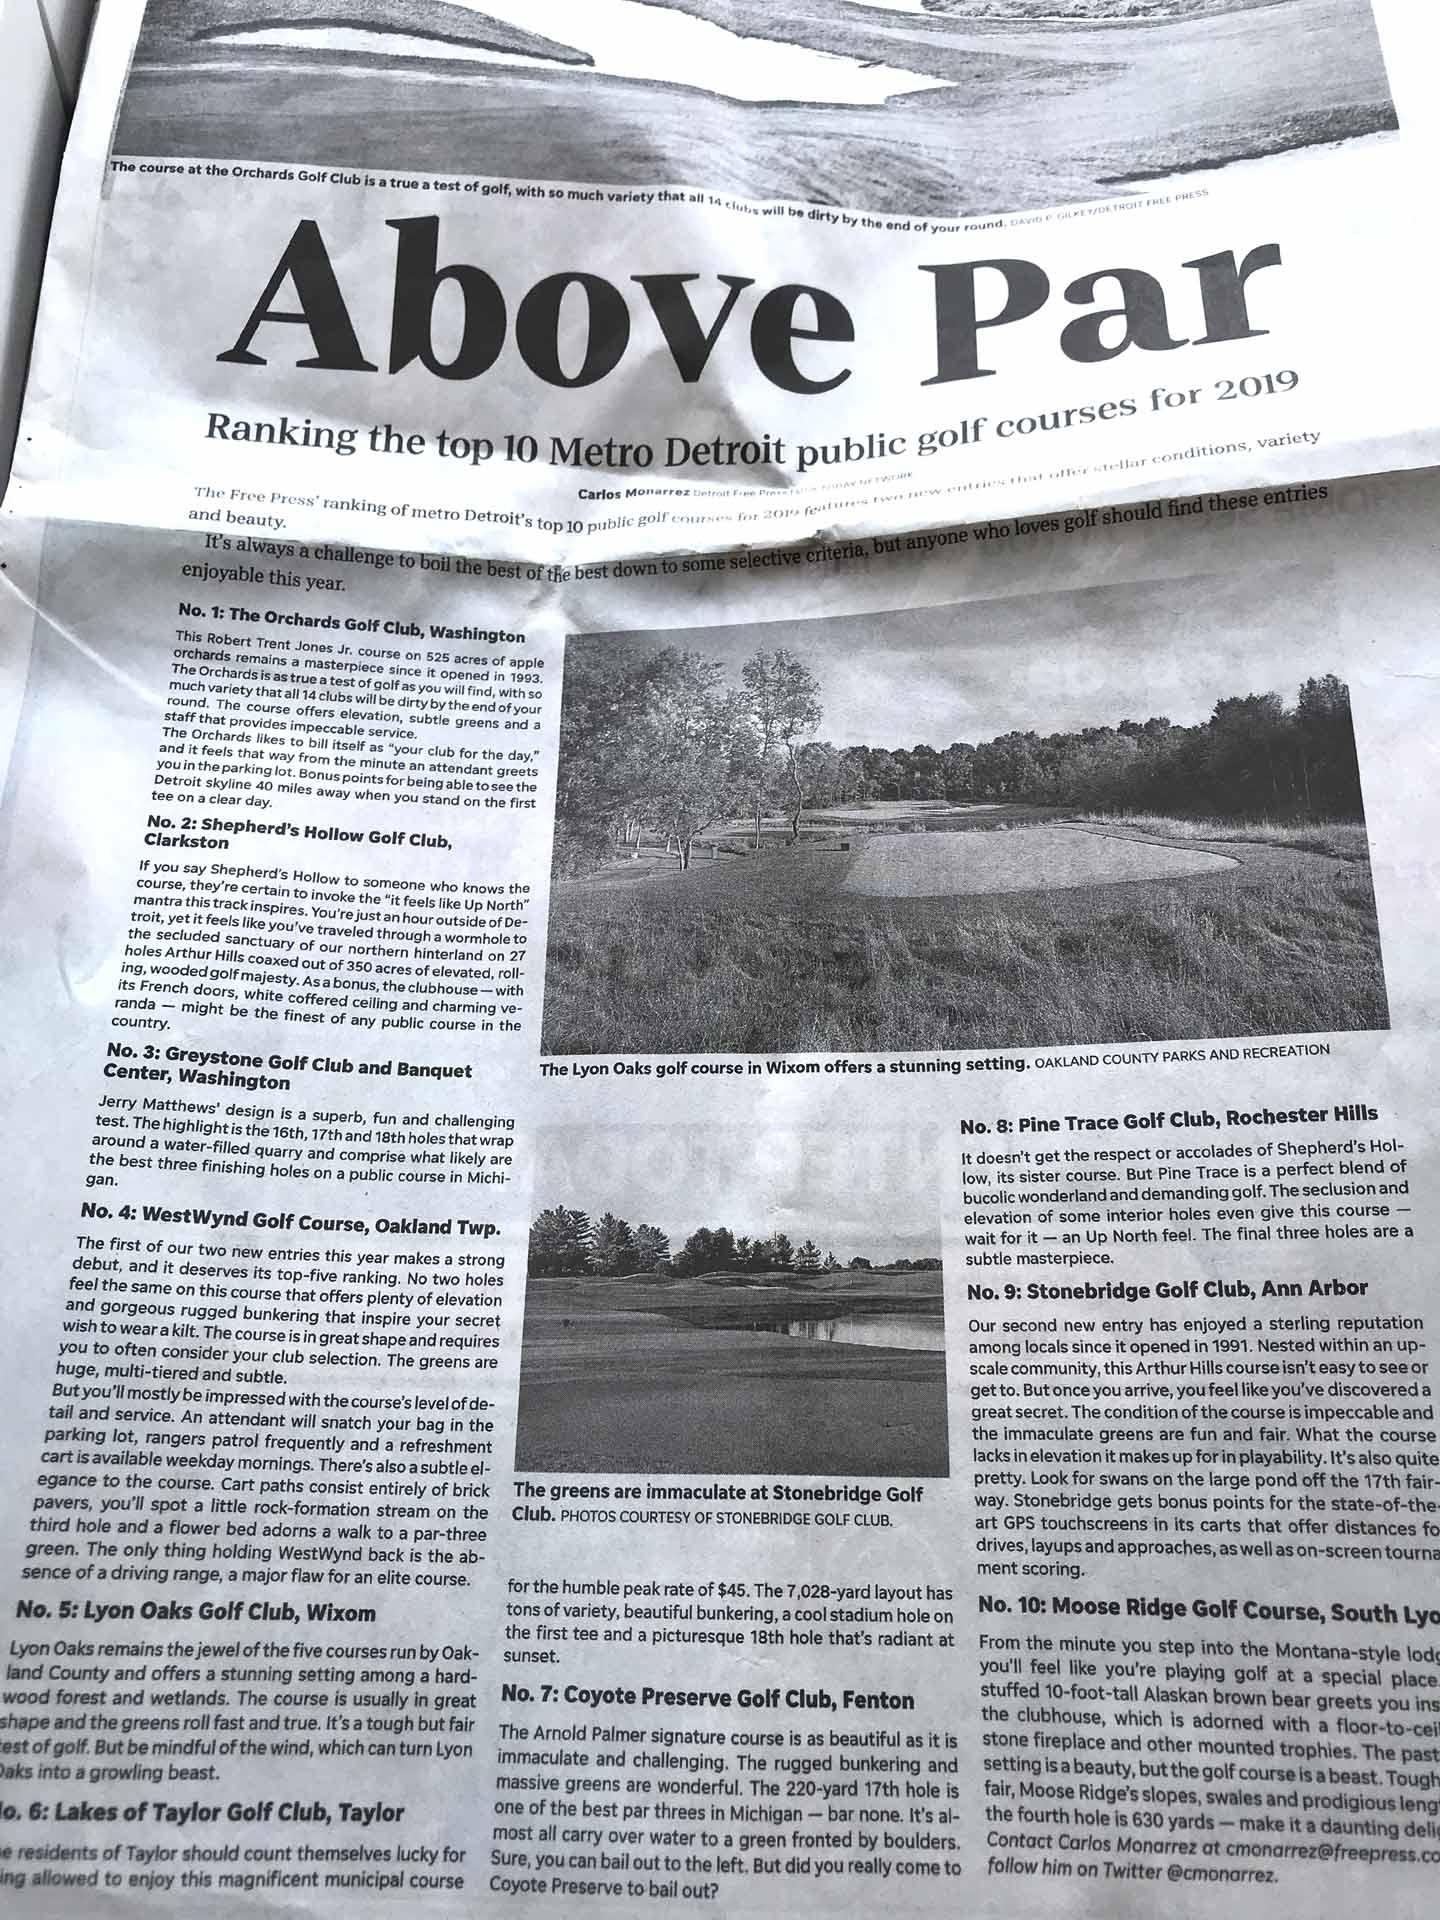 Top 10 Public Golf Course in Metro Detroit article